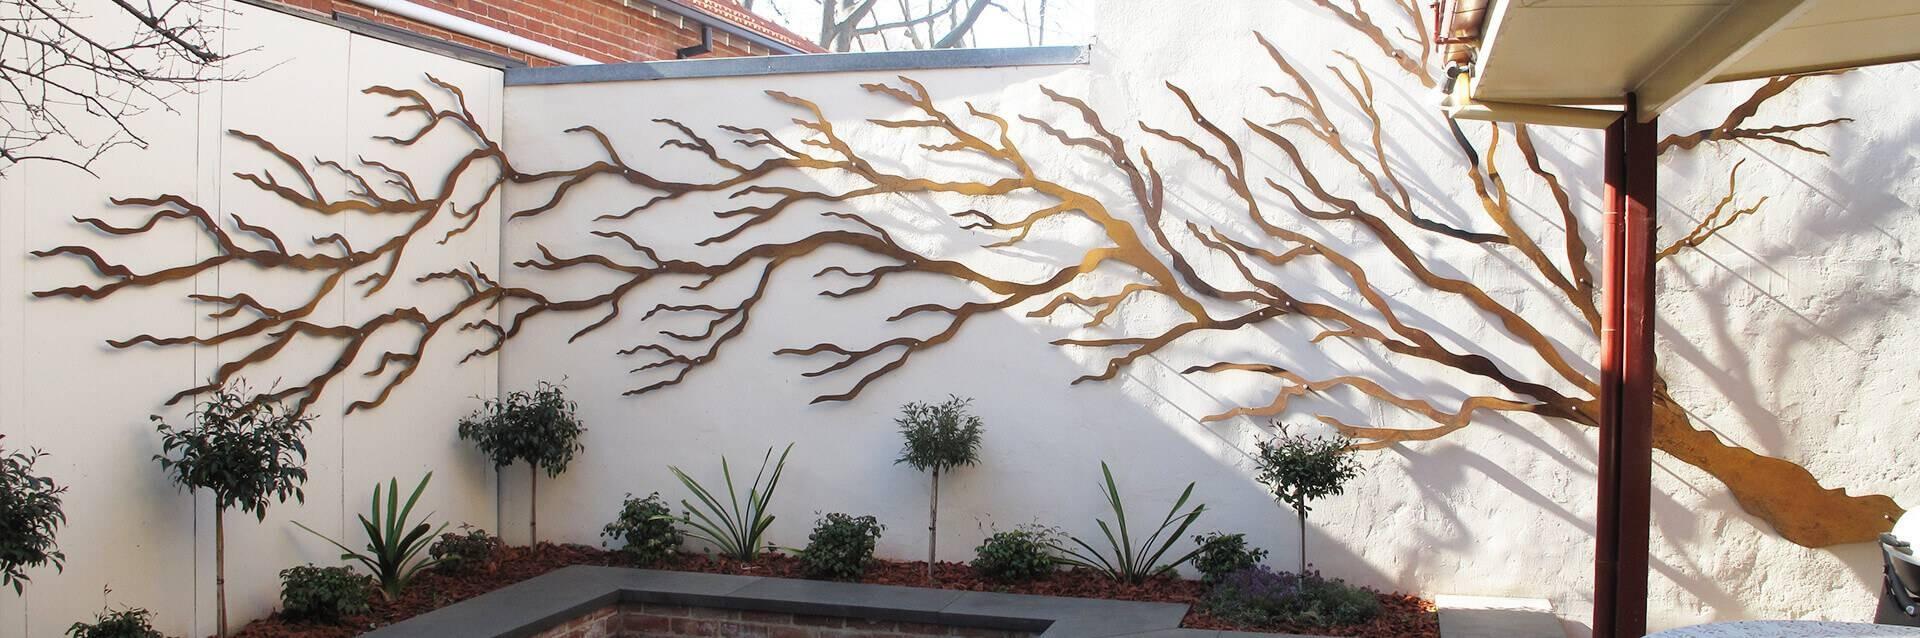 Best ideas about Garden Wall Art . Save or Pin 32 Best Ideas of Metal Gate Wall Art Now.